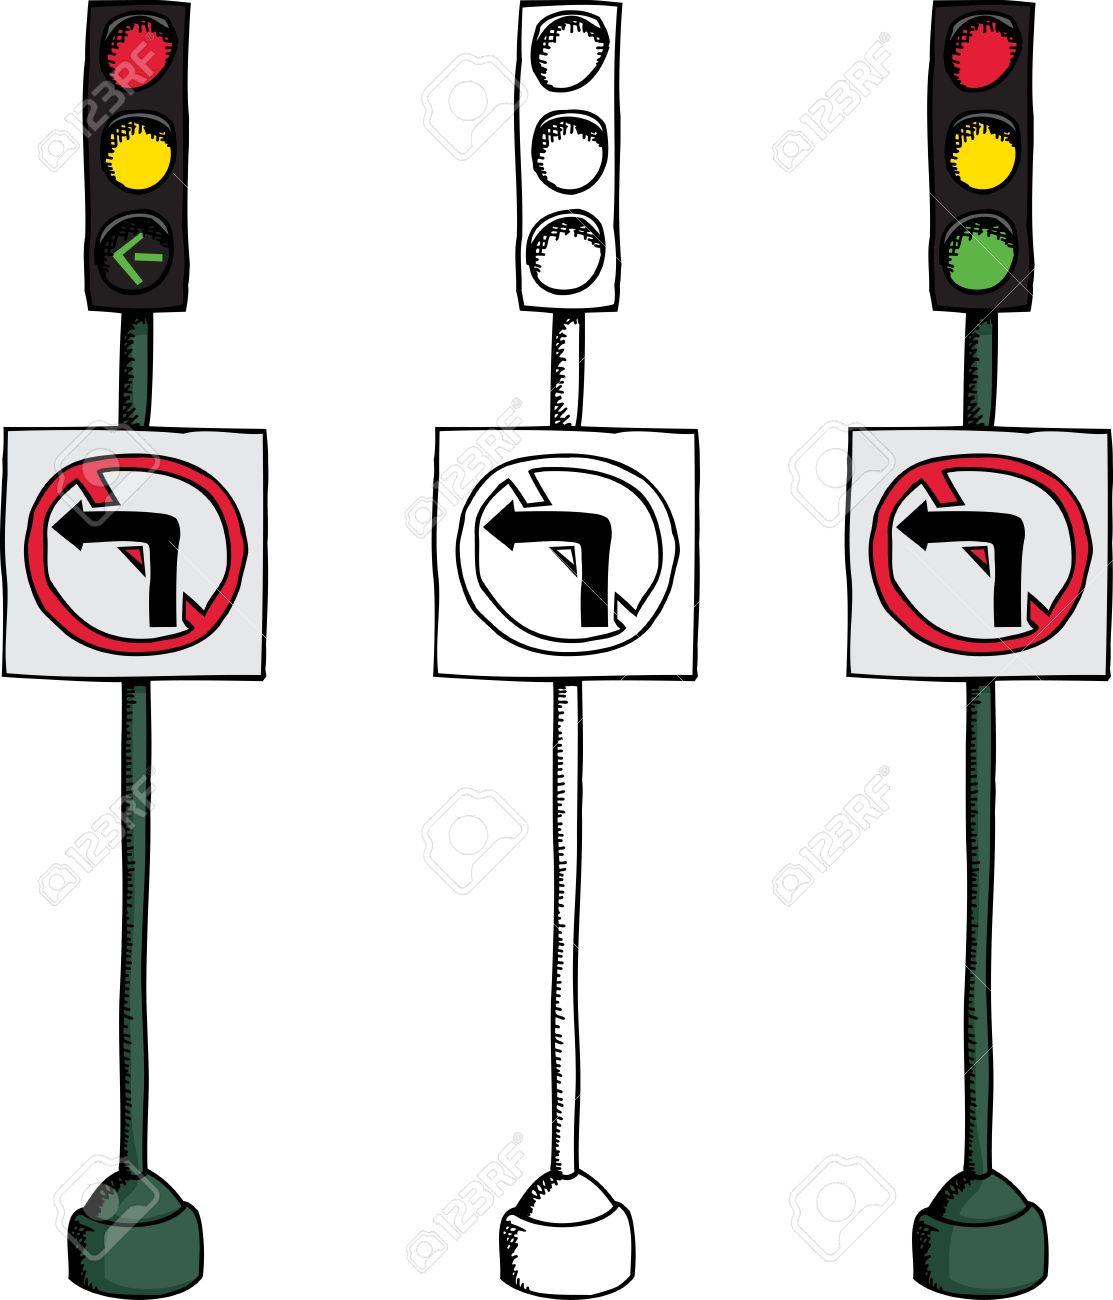 No Left Turn Traffic Light Over White Background Royalty Free.